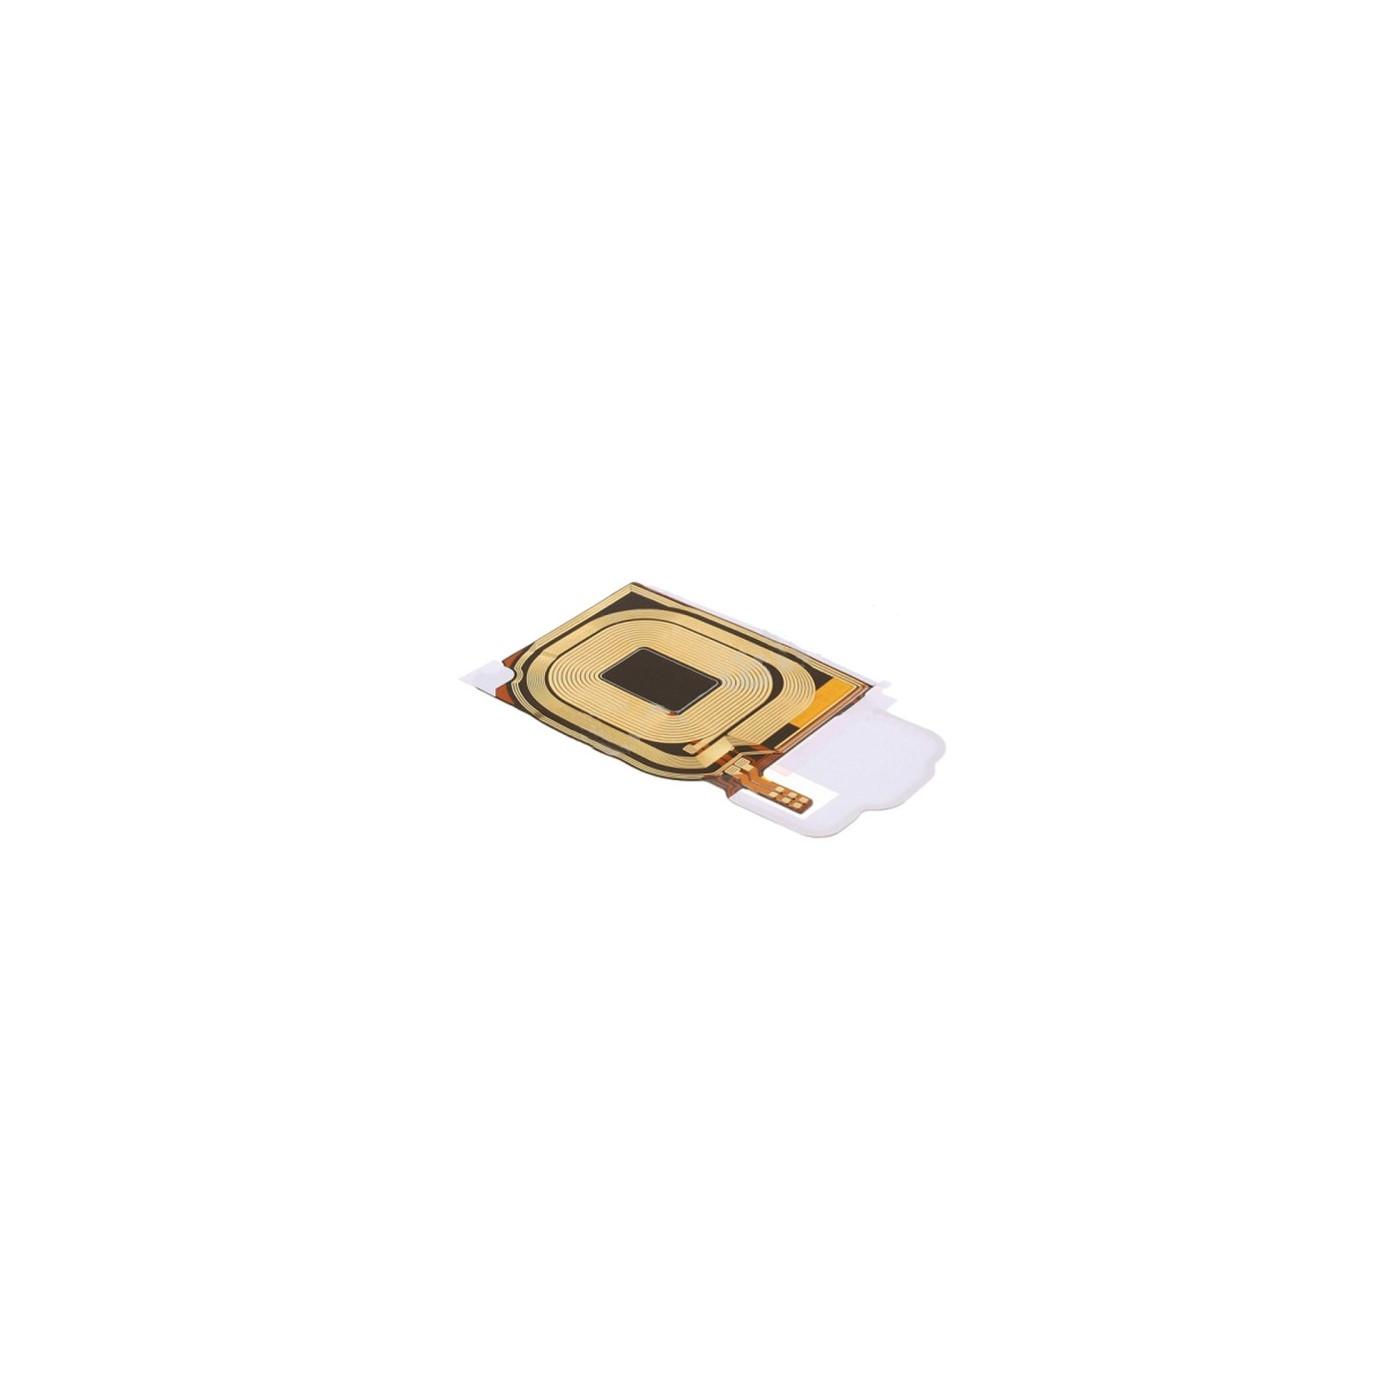 IC Chip NFC Ricevitore di Carica wirelless per Galaxy S6 Edge G925